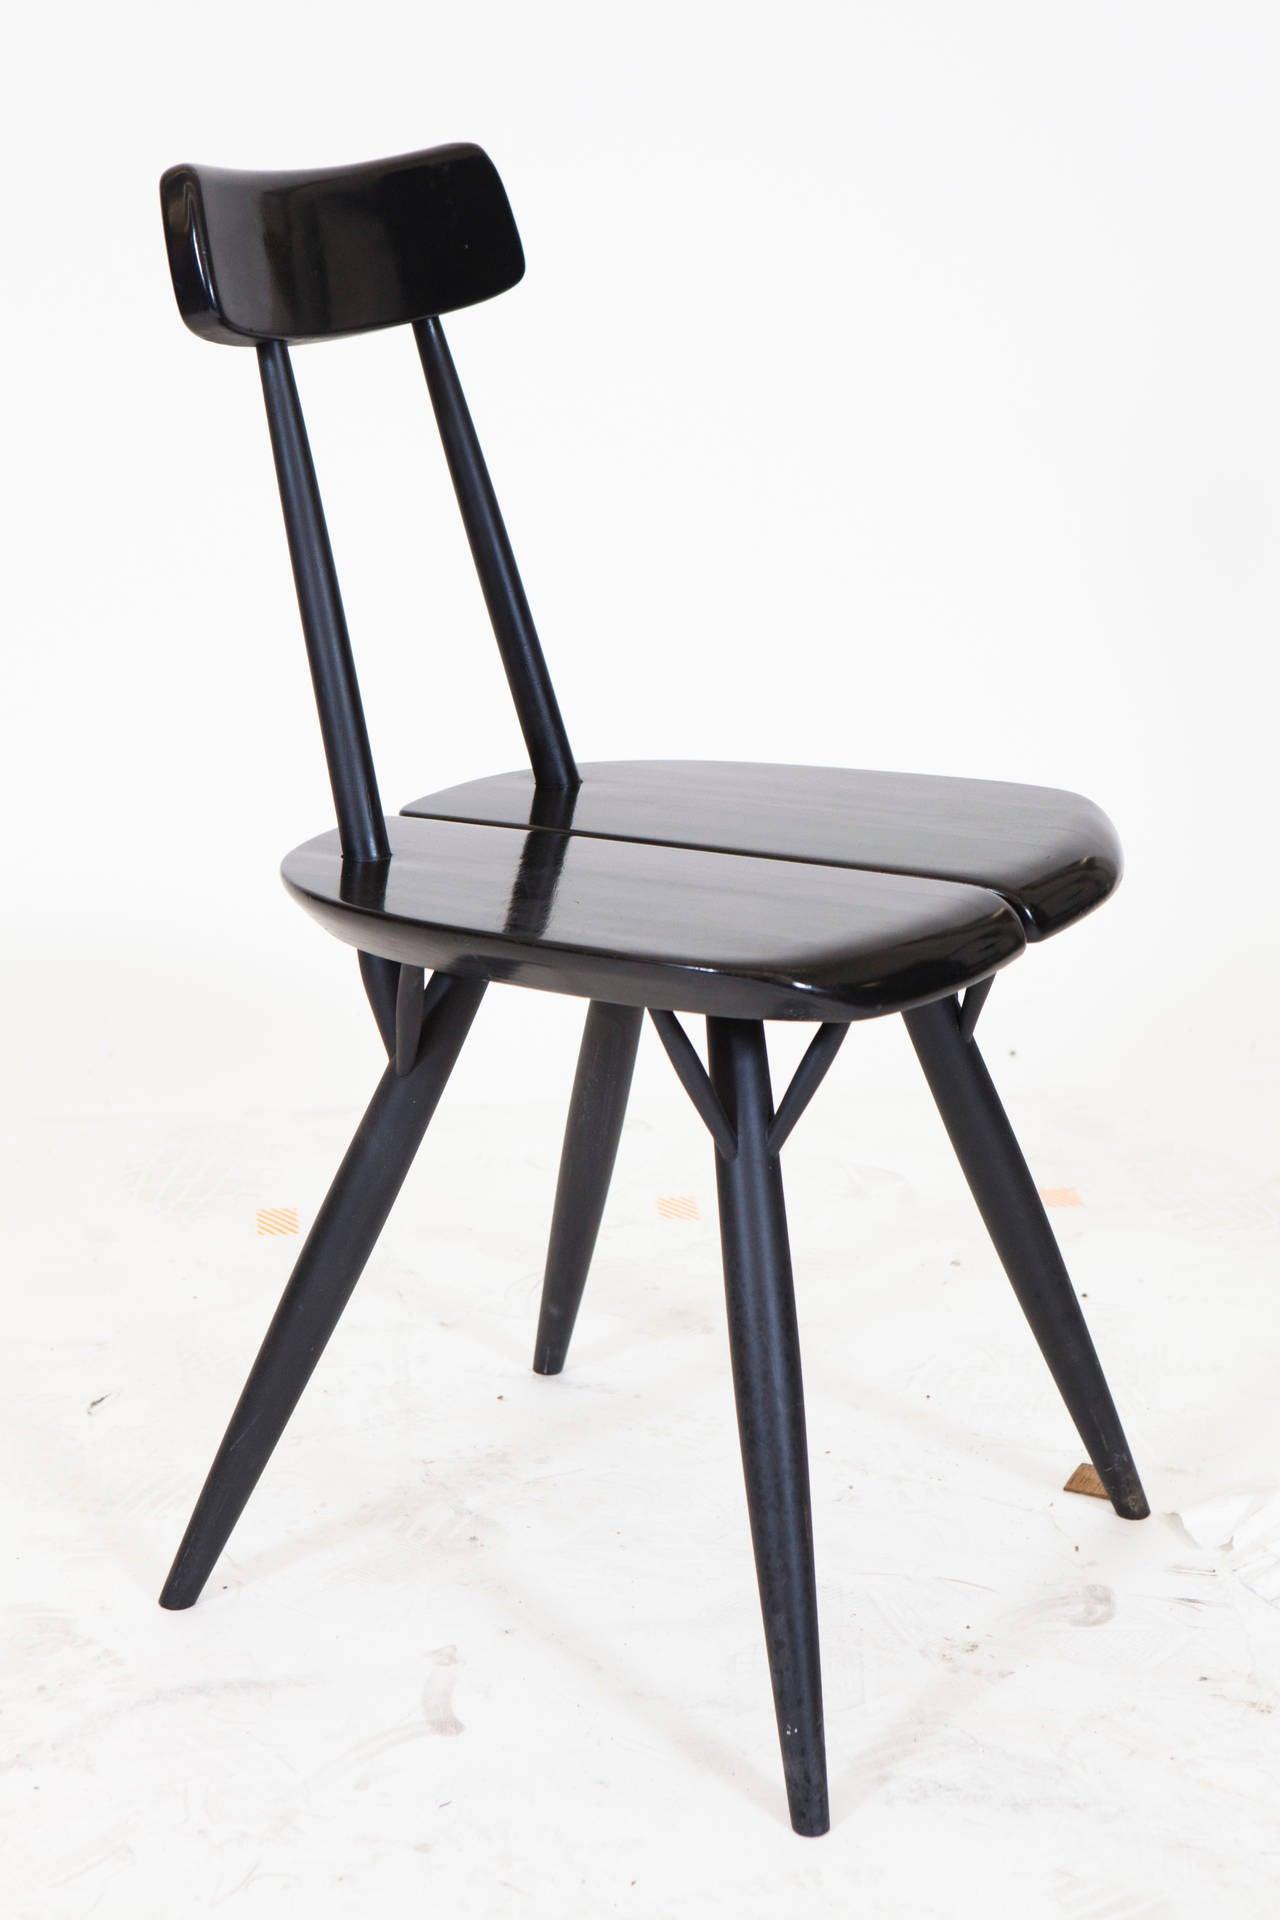 Modern Pirkka Table and Chairs by Ilmari Taplovaara For Sale